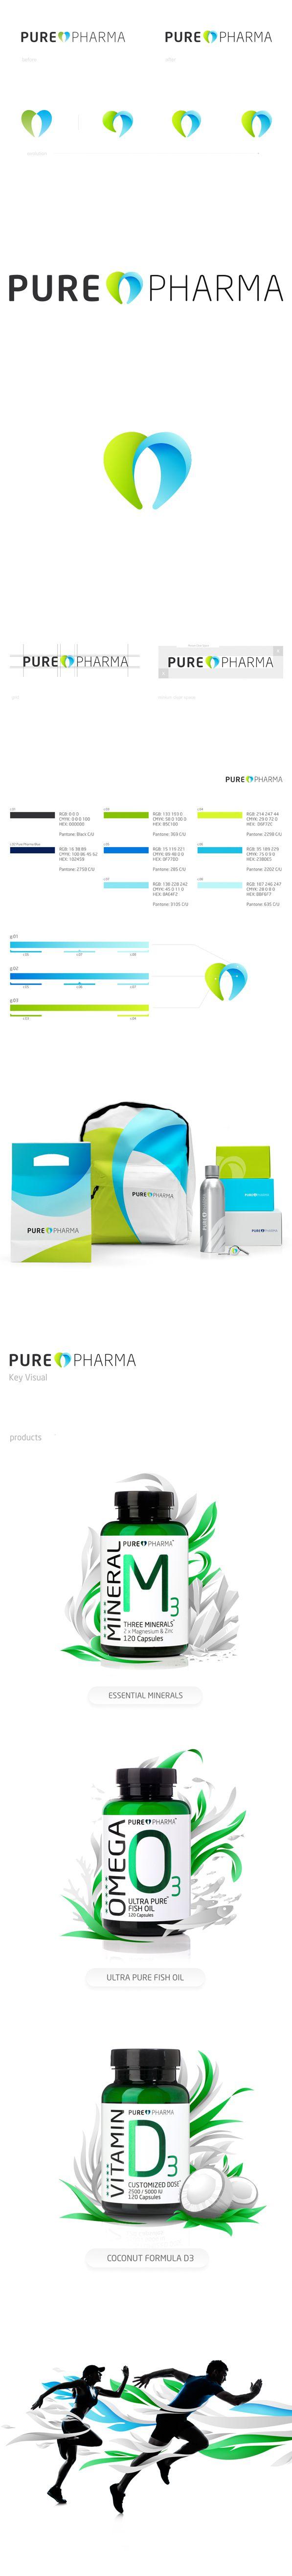 PurePharma by Fuse Collective, via Behance